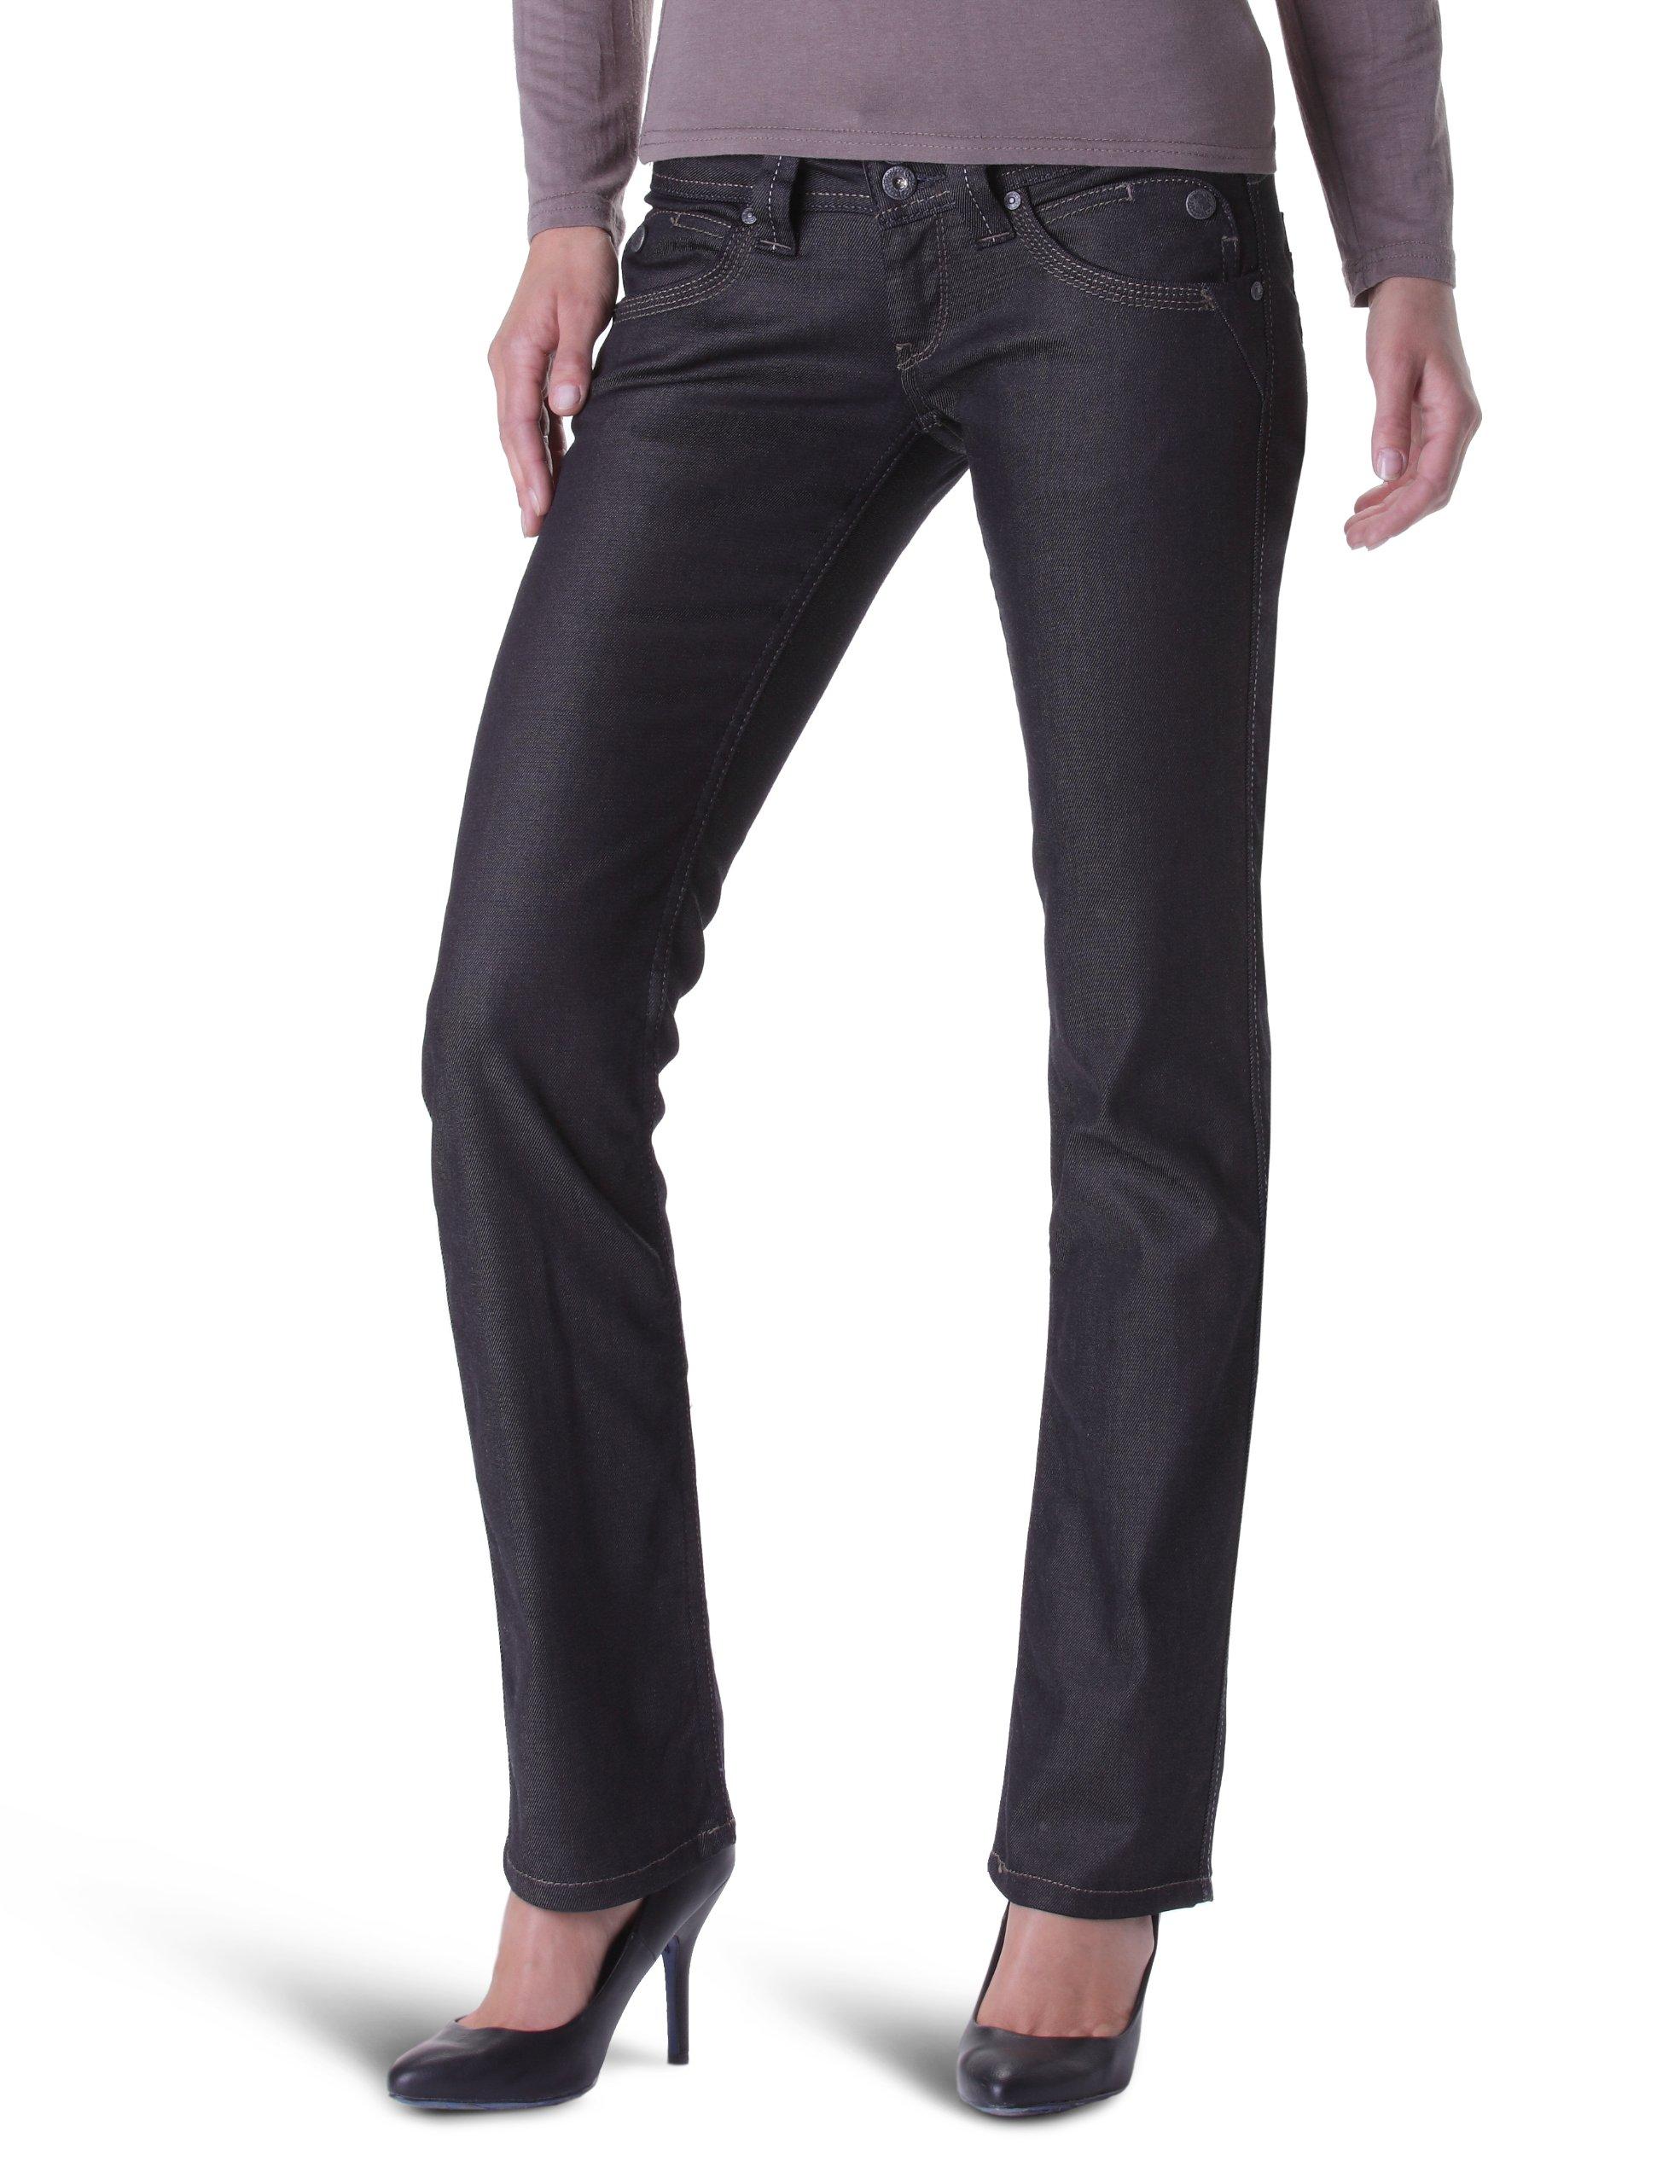 regular l34 Droit Brut Pepe PerivalJean Jeans Femme BleudenimW30 XZOiwkPuT